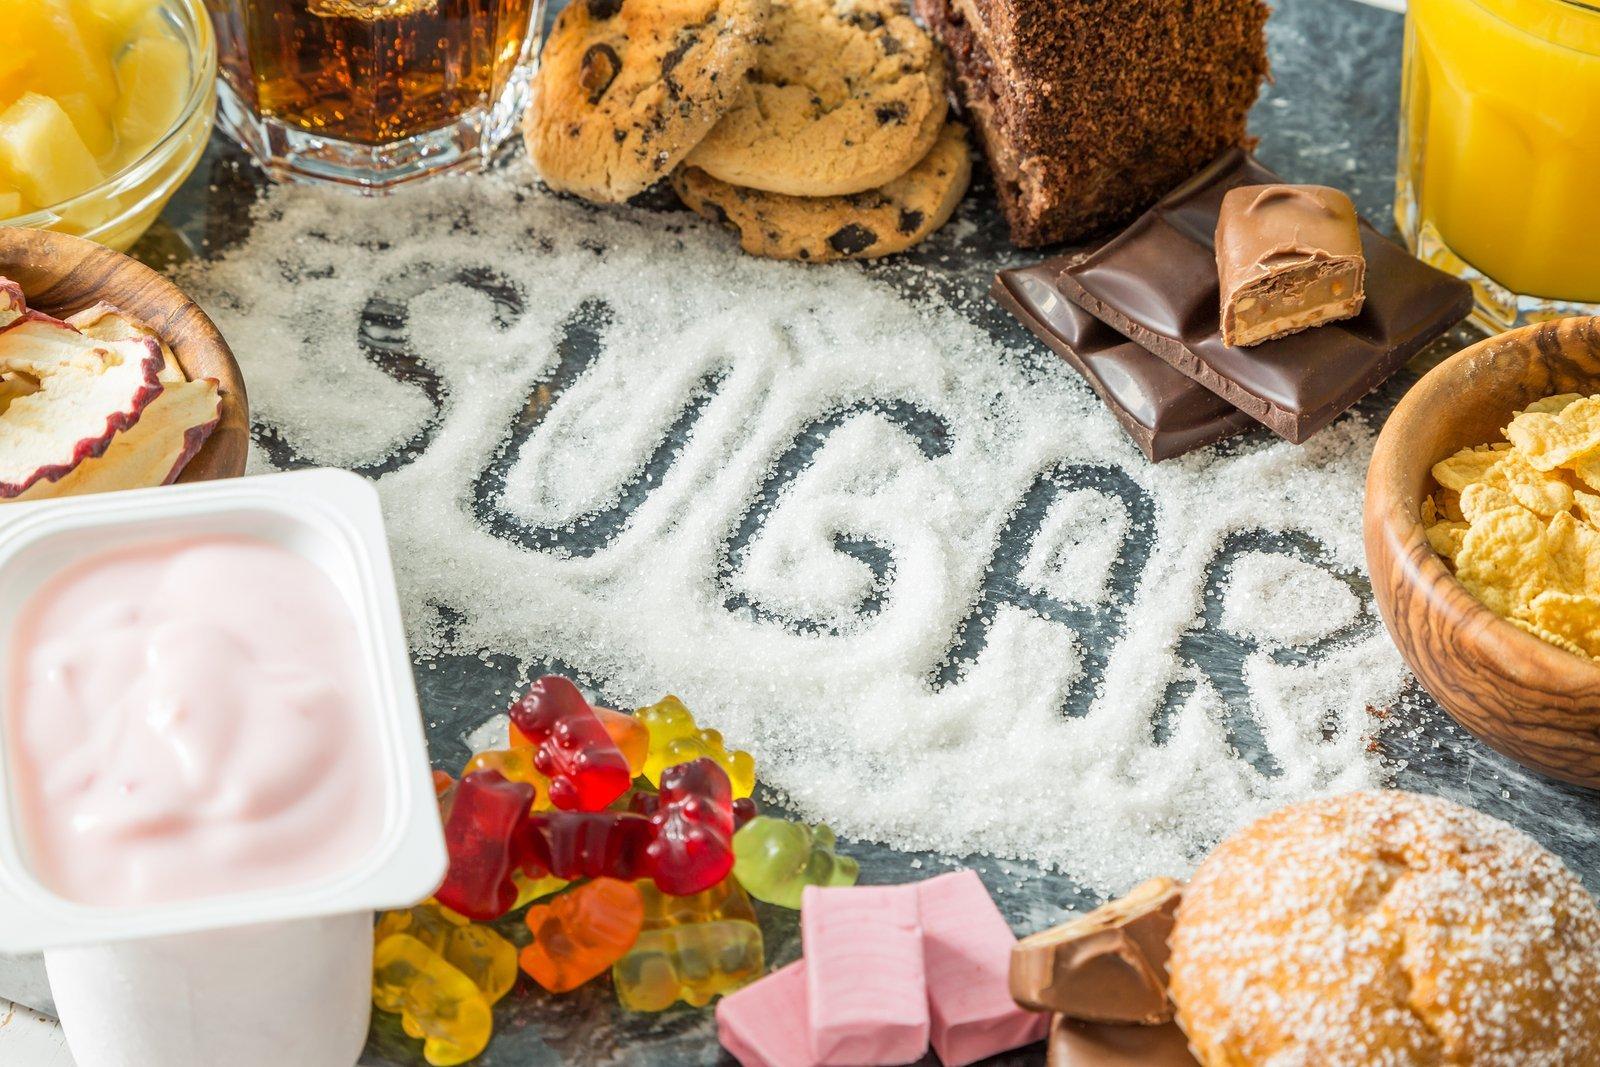 Sweets, sugar, weight loss, health, insulin, stress